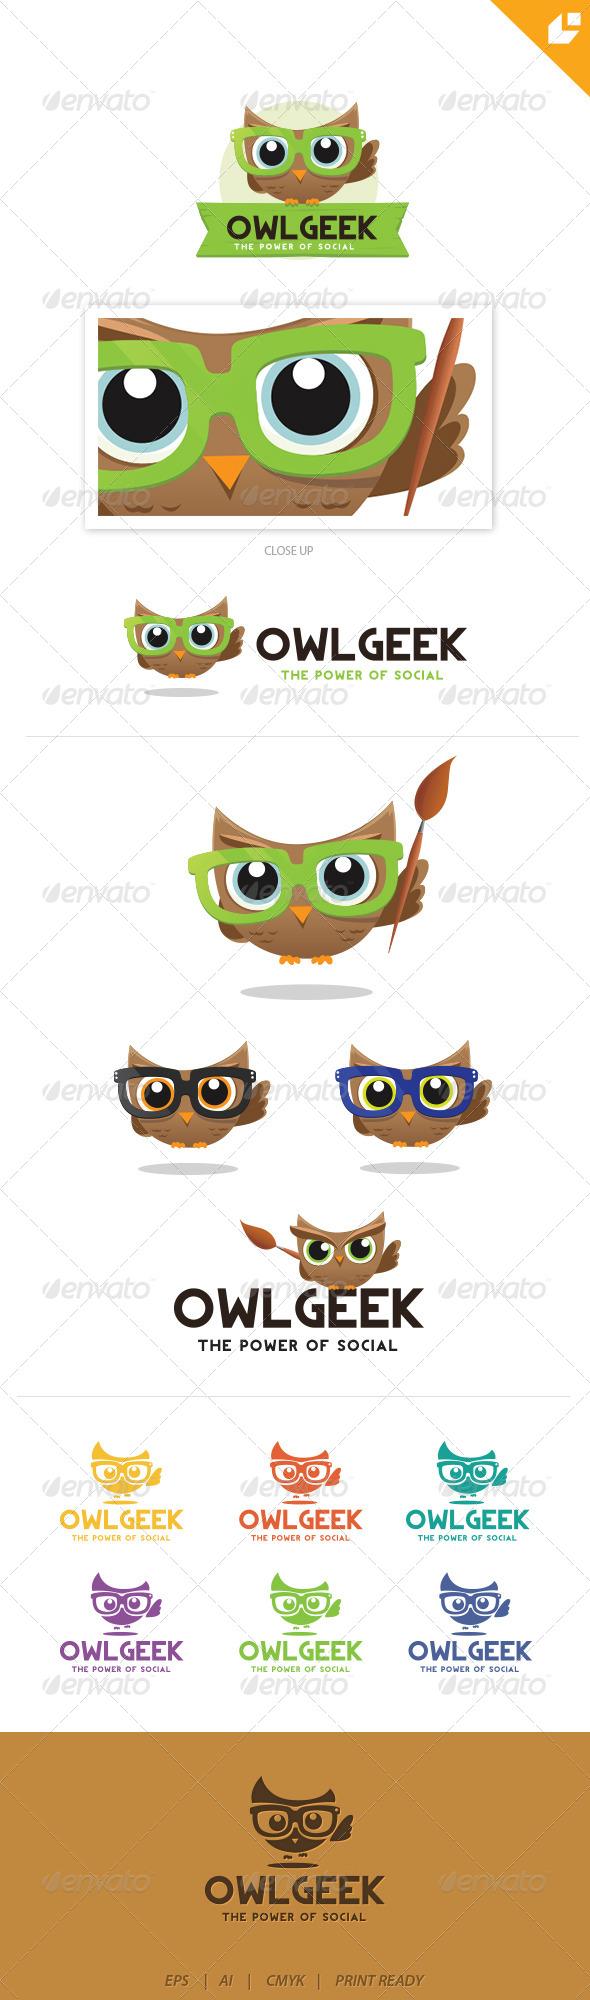 GraphicRiver Owl Geek Logo 4405601